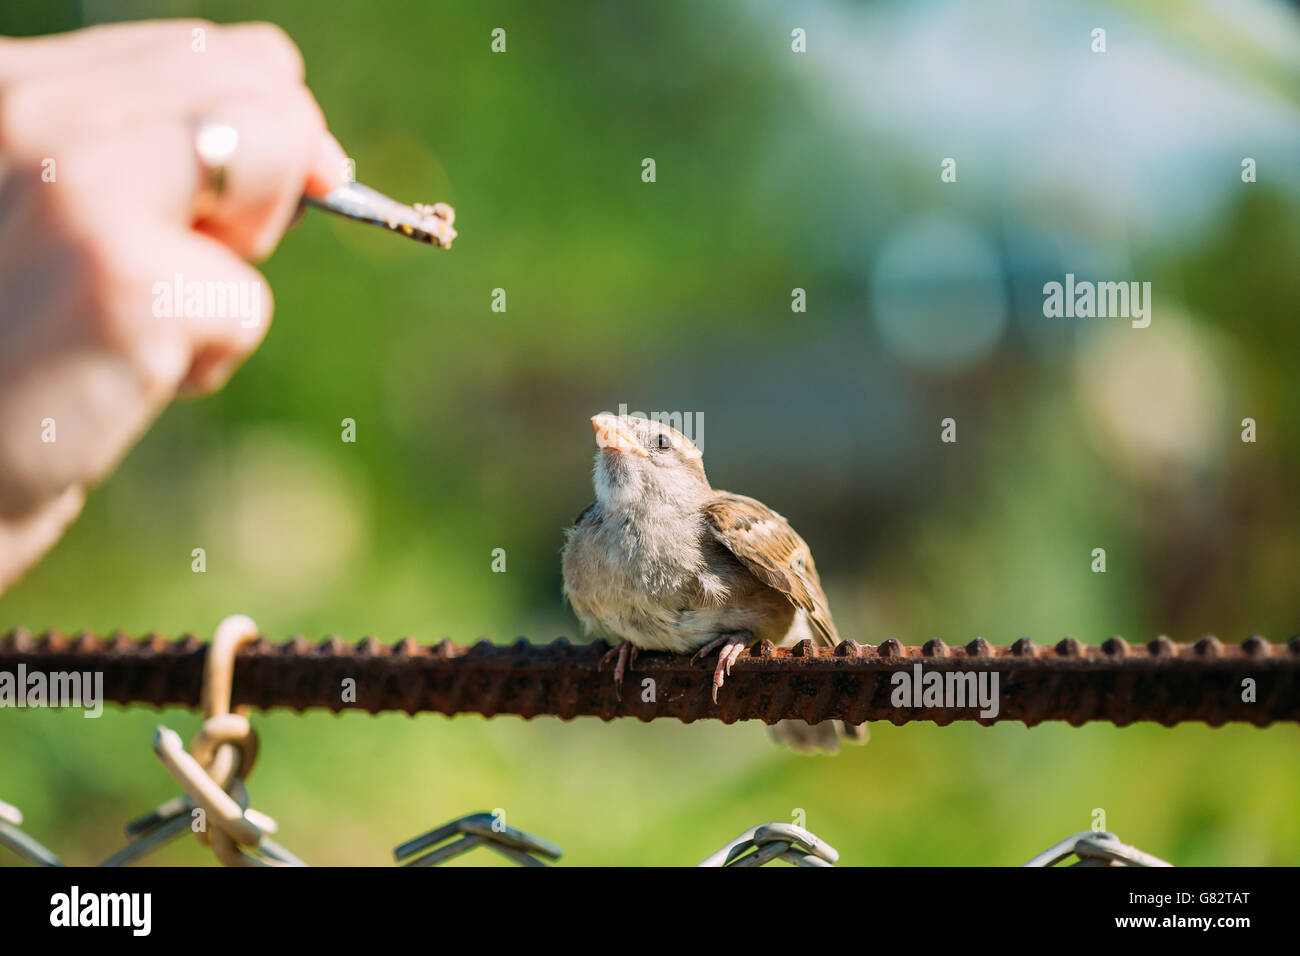 Alimentación de la joven chica, pájaro Gorrión Passer domesticus Yellow-Beaked Foto de stock